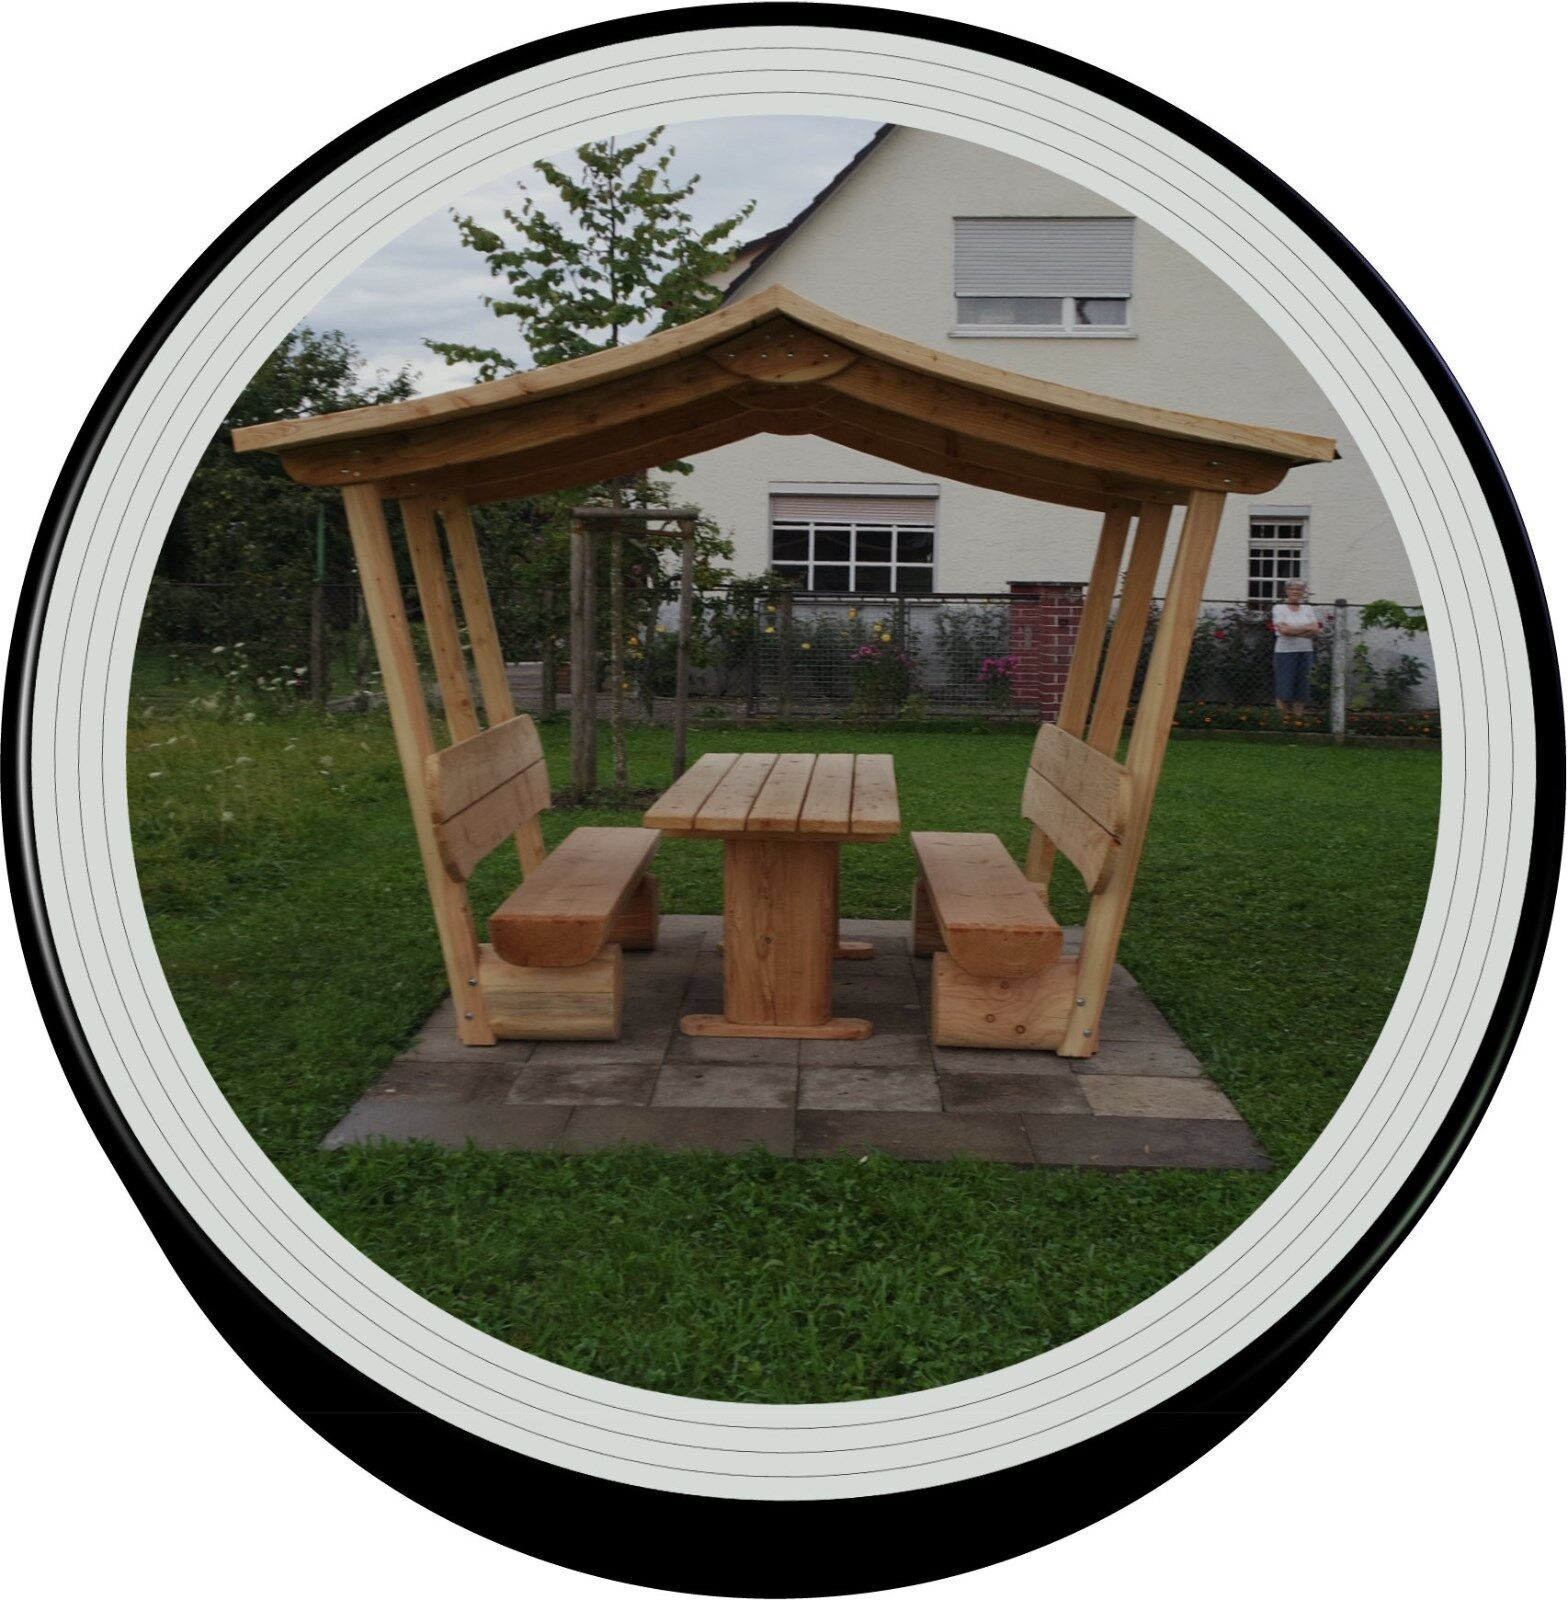 Holzmöbel.Sitzmöbel.Sitzgruppe aus holz.Pavillon.Gartenmöbe mit Dach.